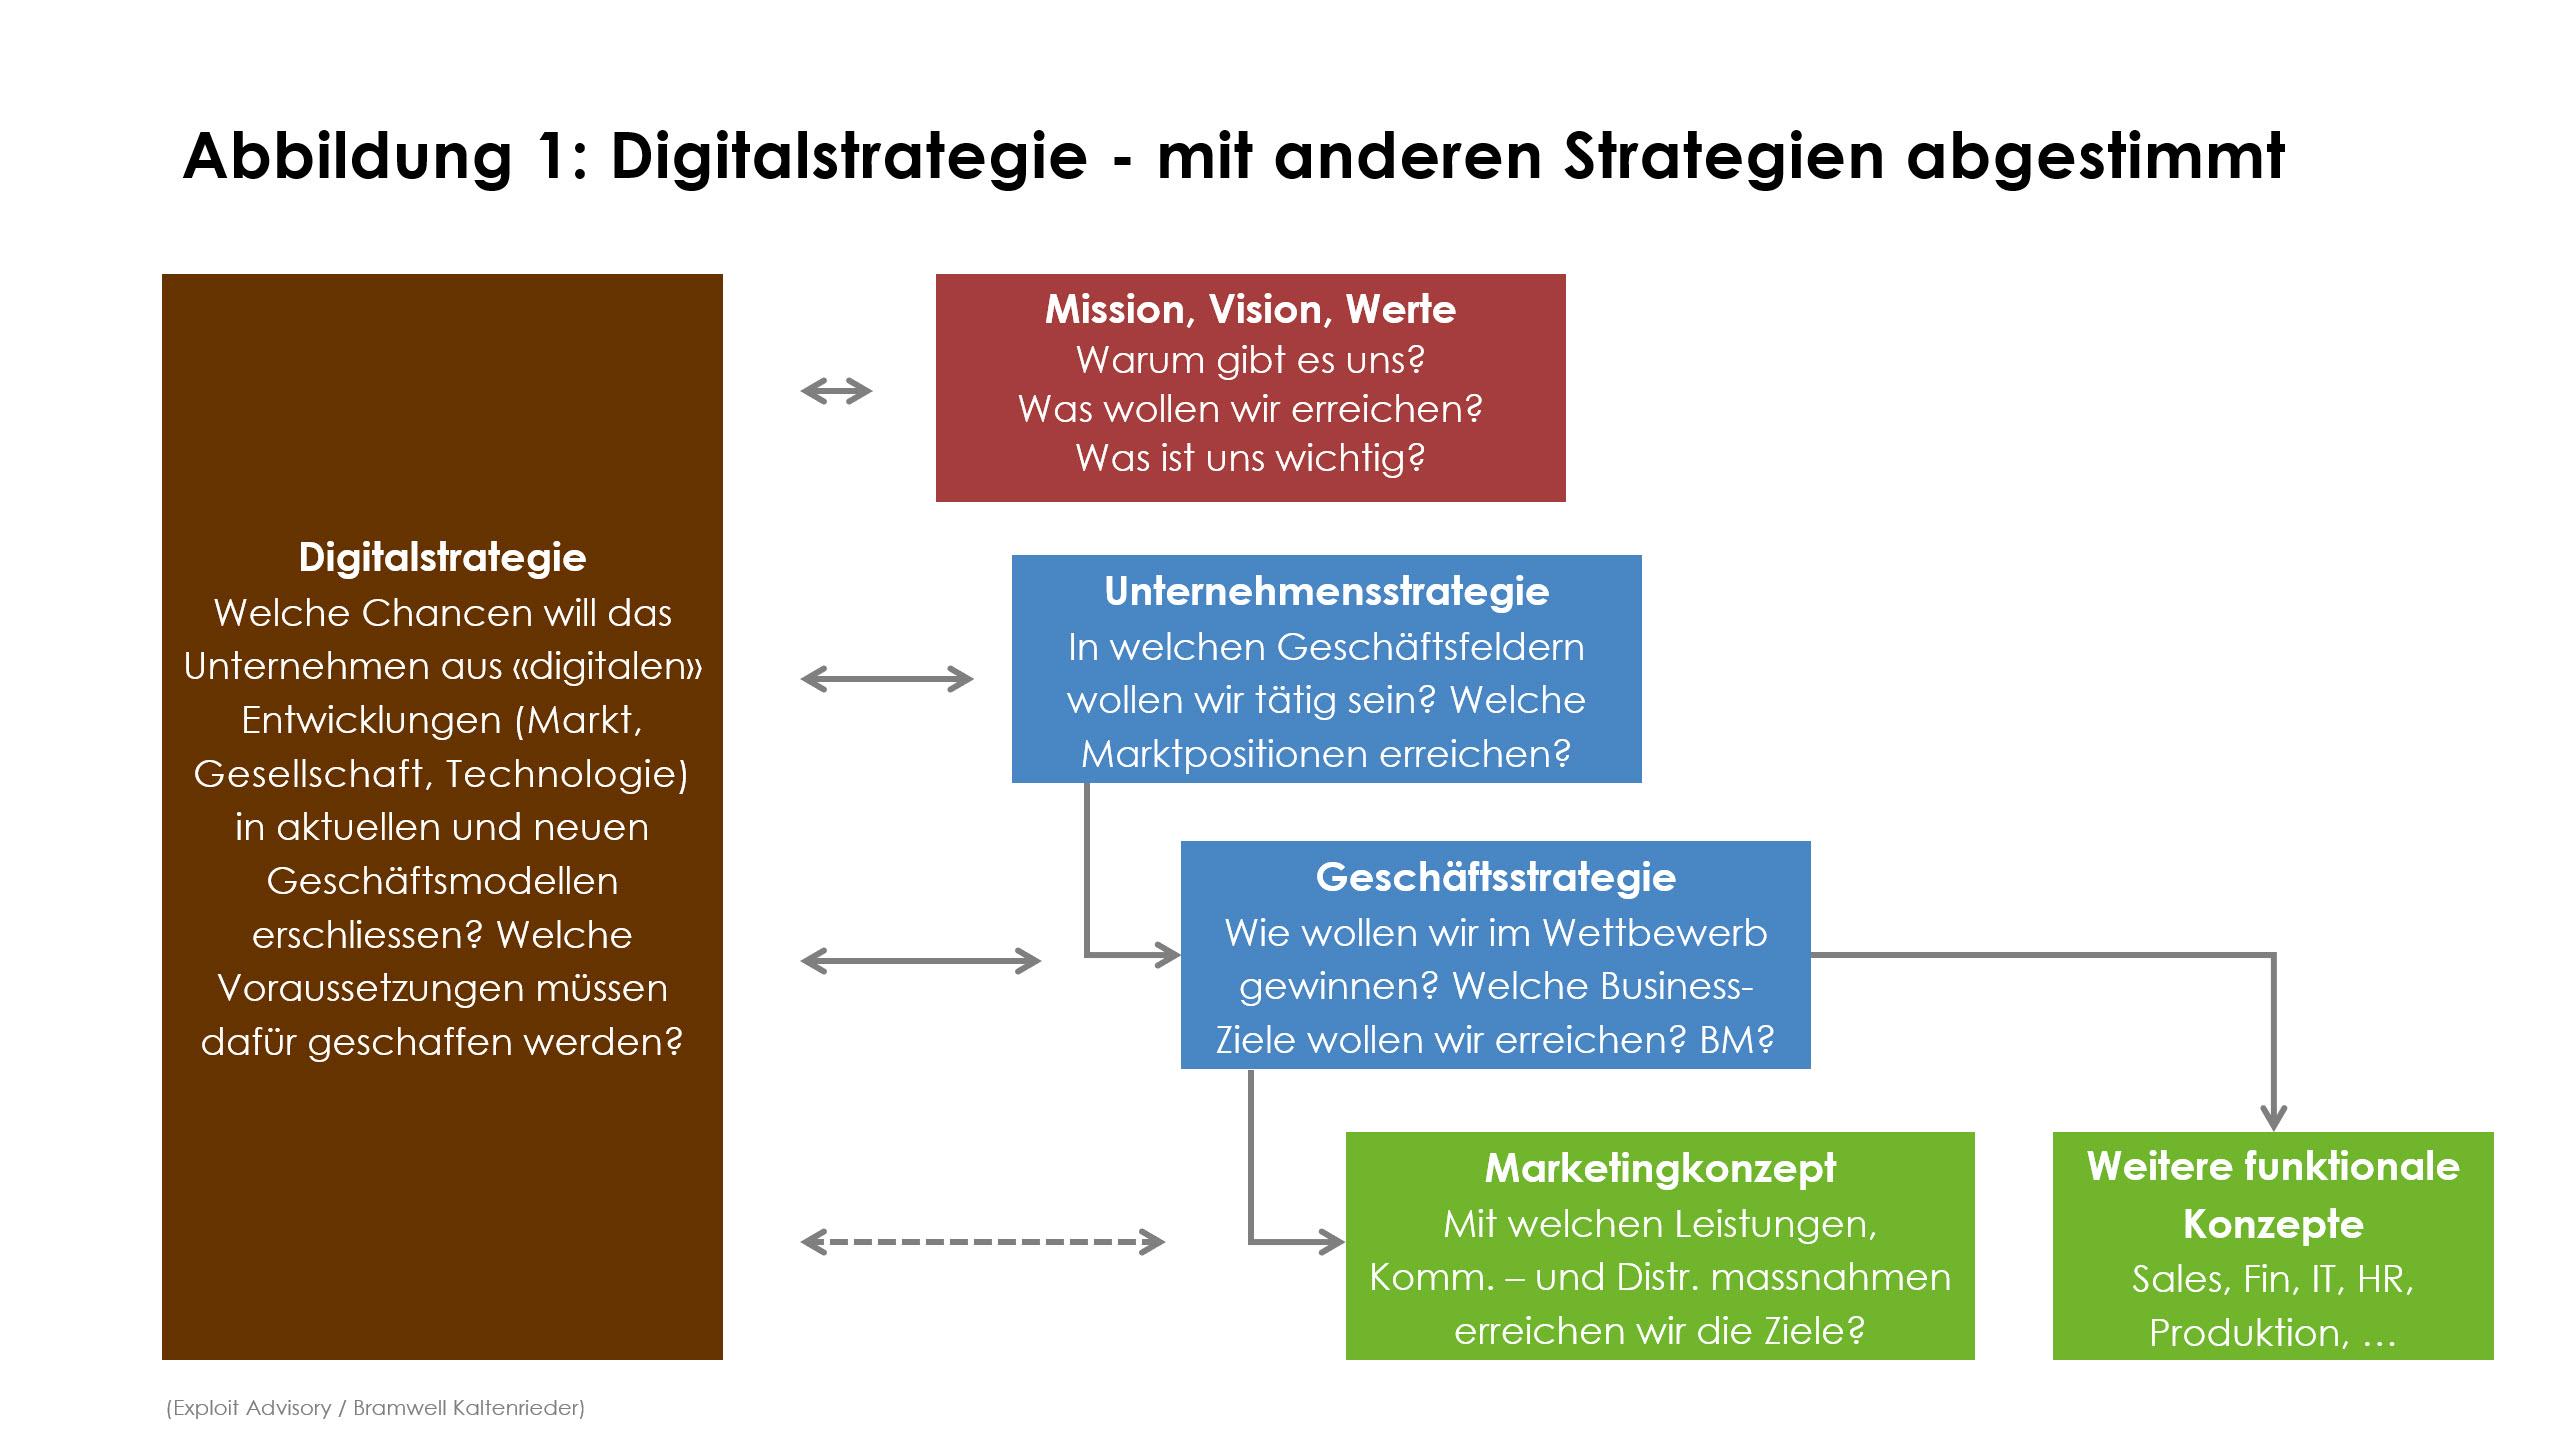 Digitalstrategie - mit anderen Strategien abgestimmt